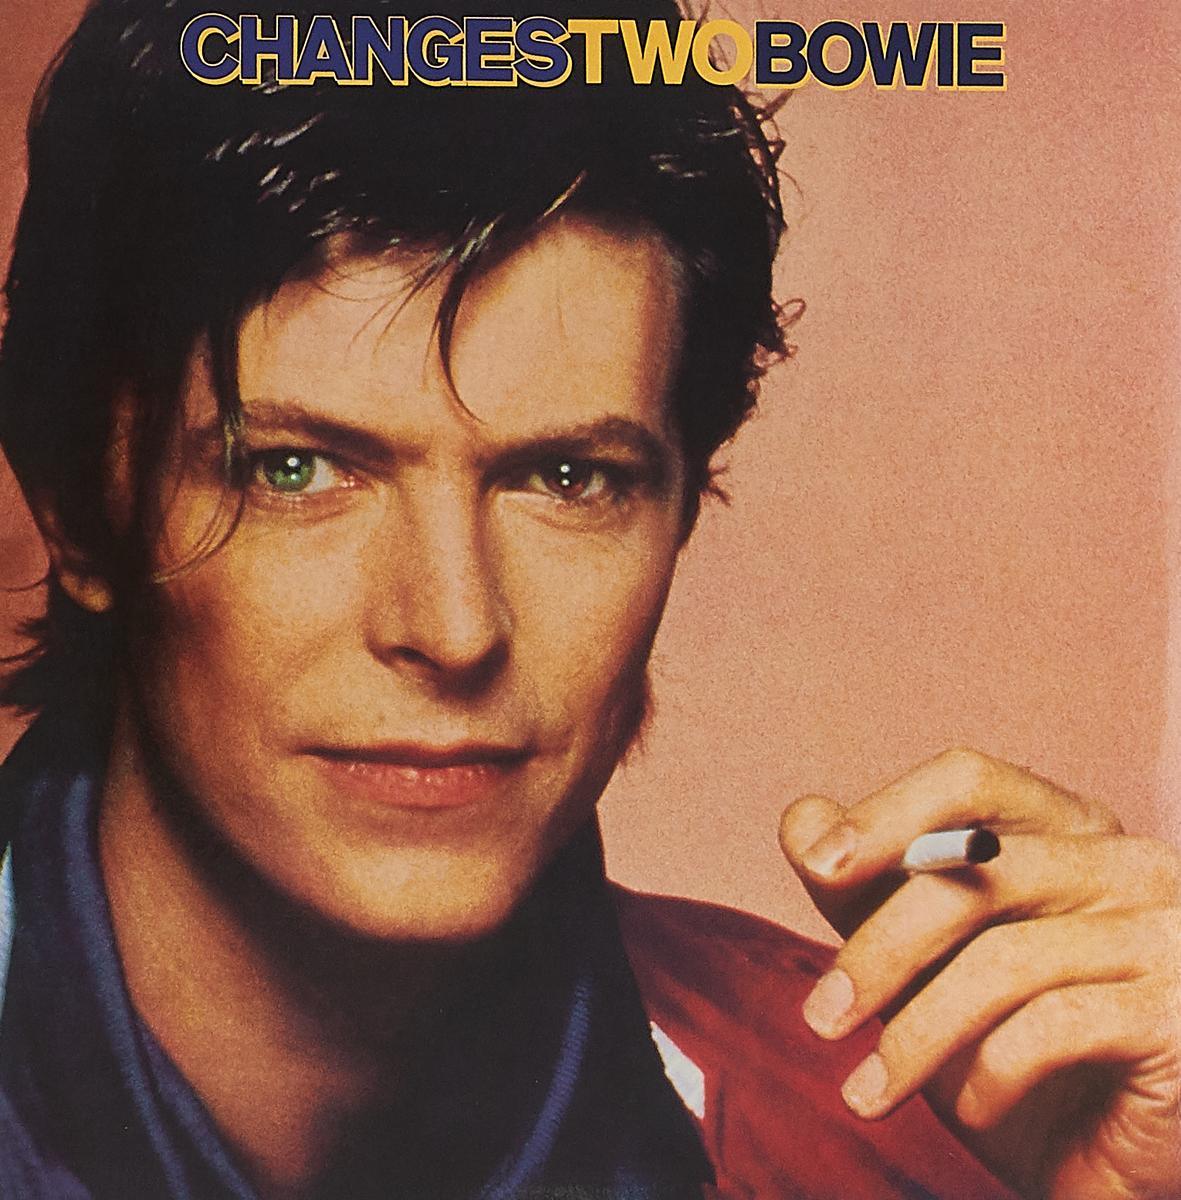 лучшая цена Дэвид Боуи David Bowie. Changestwobowie (LP)